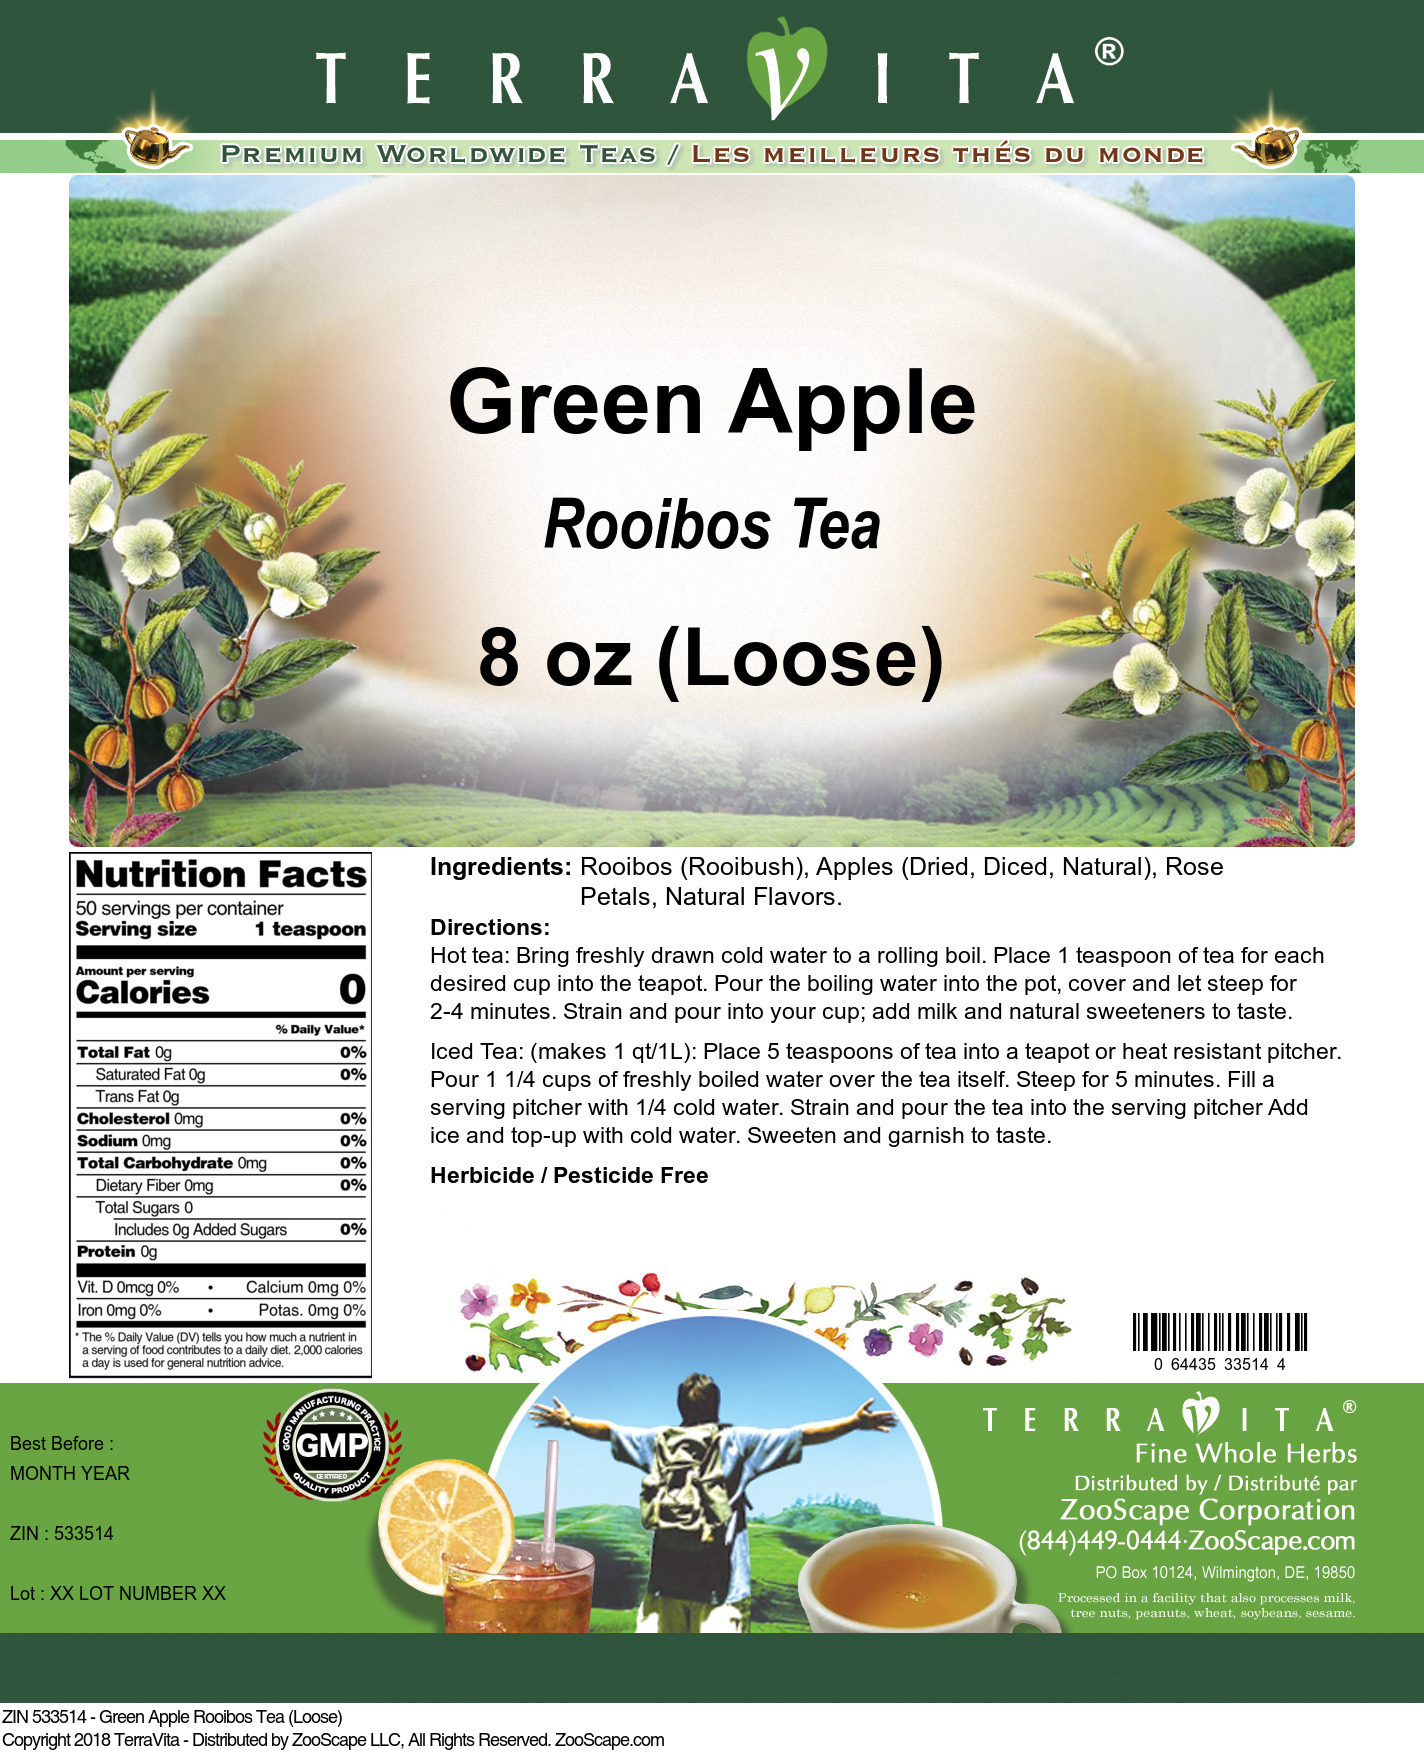 Green Apple Rooibos Tea